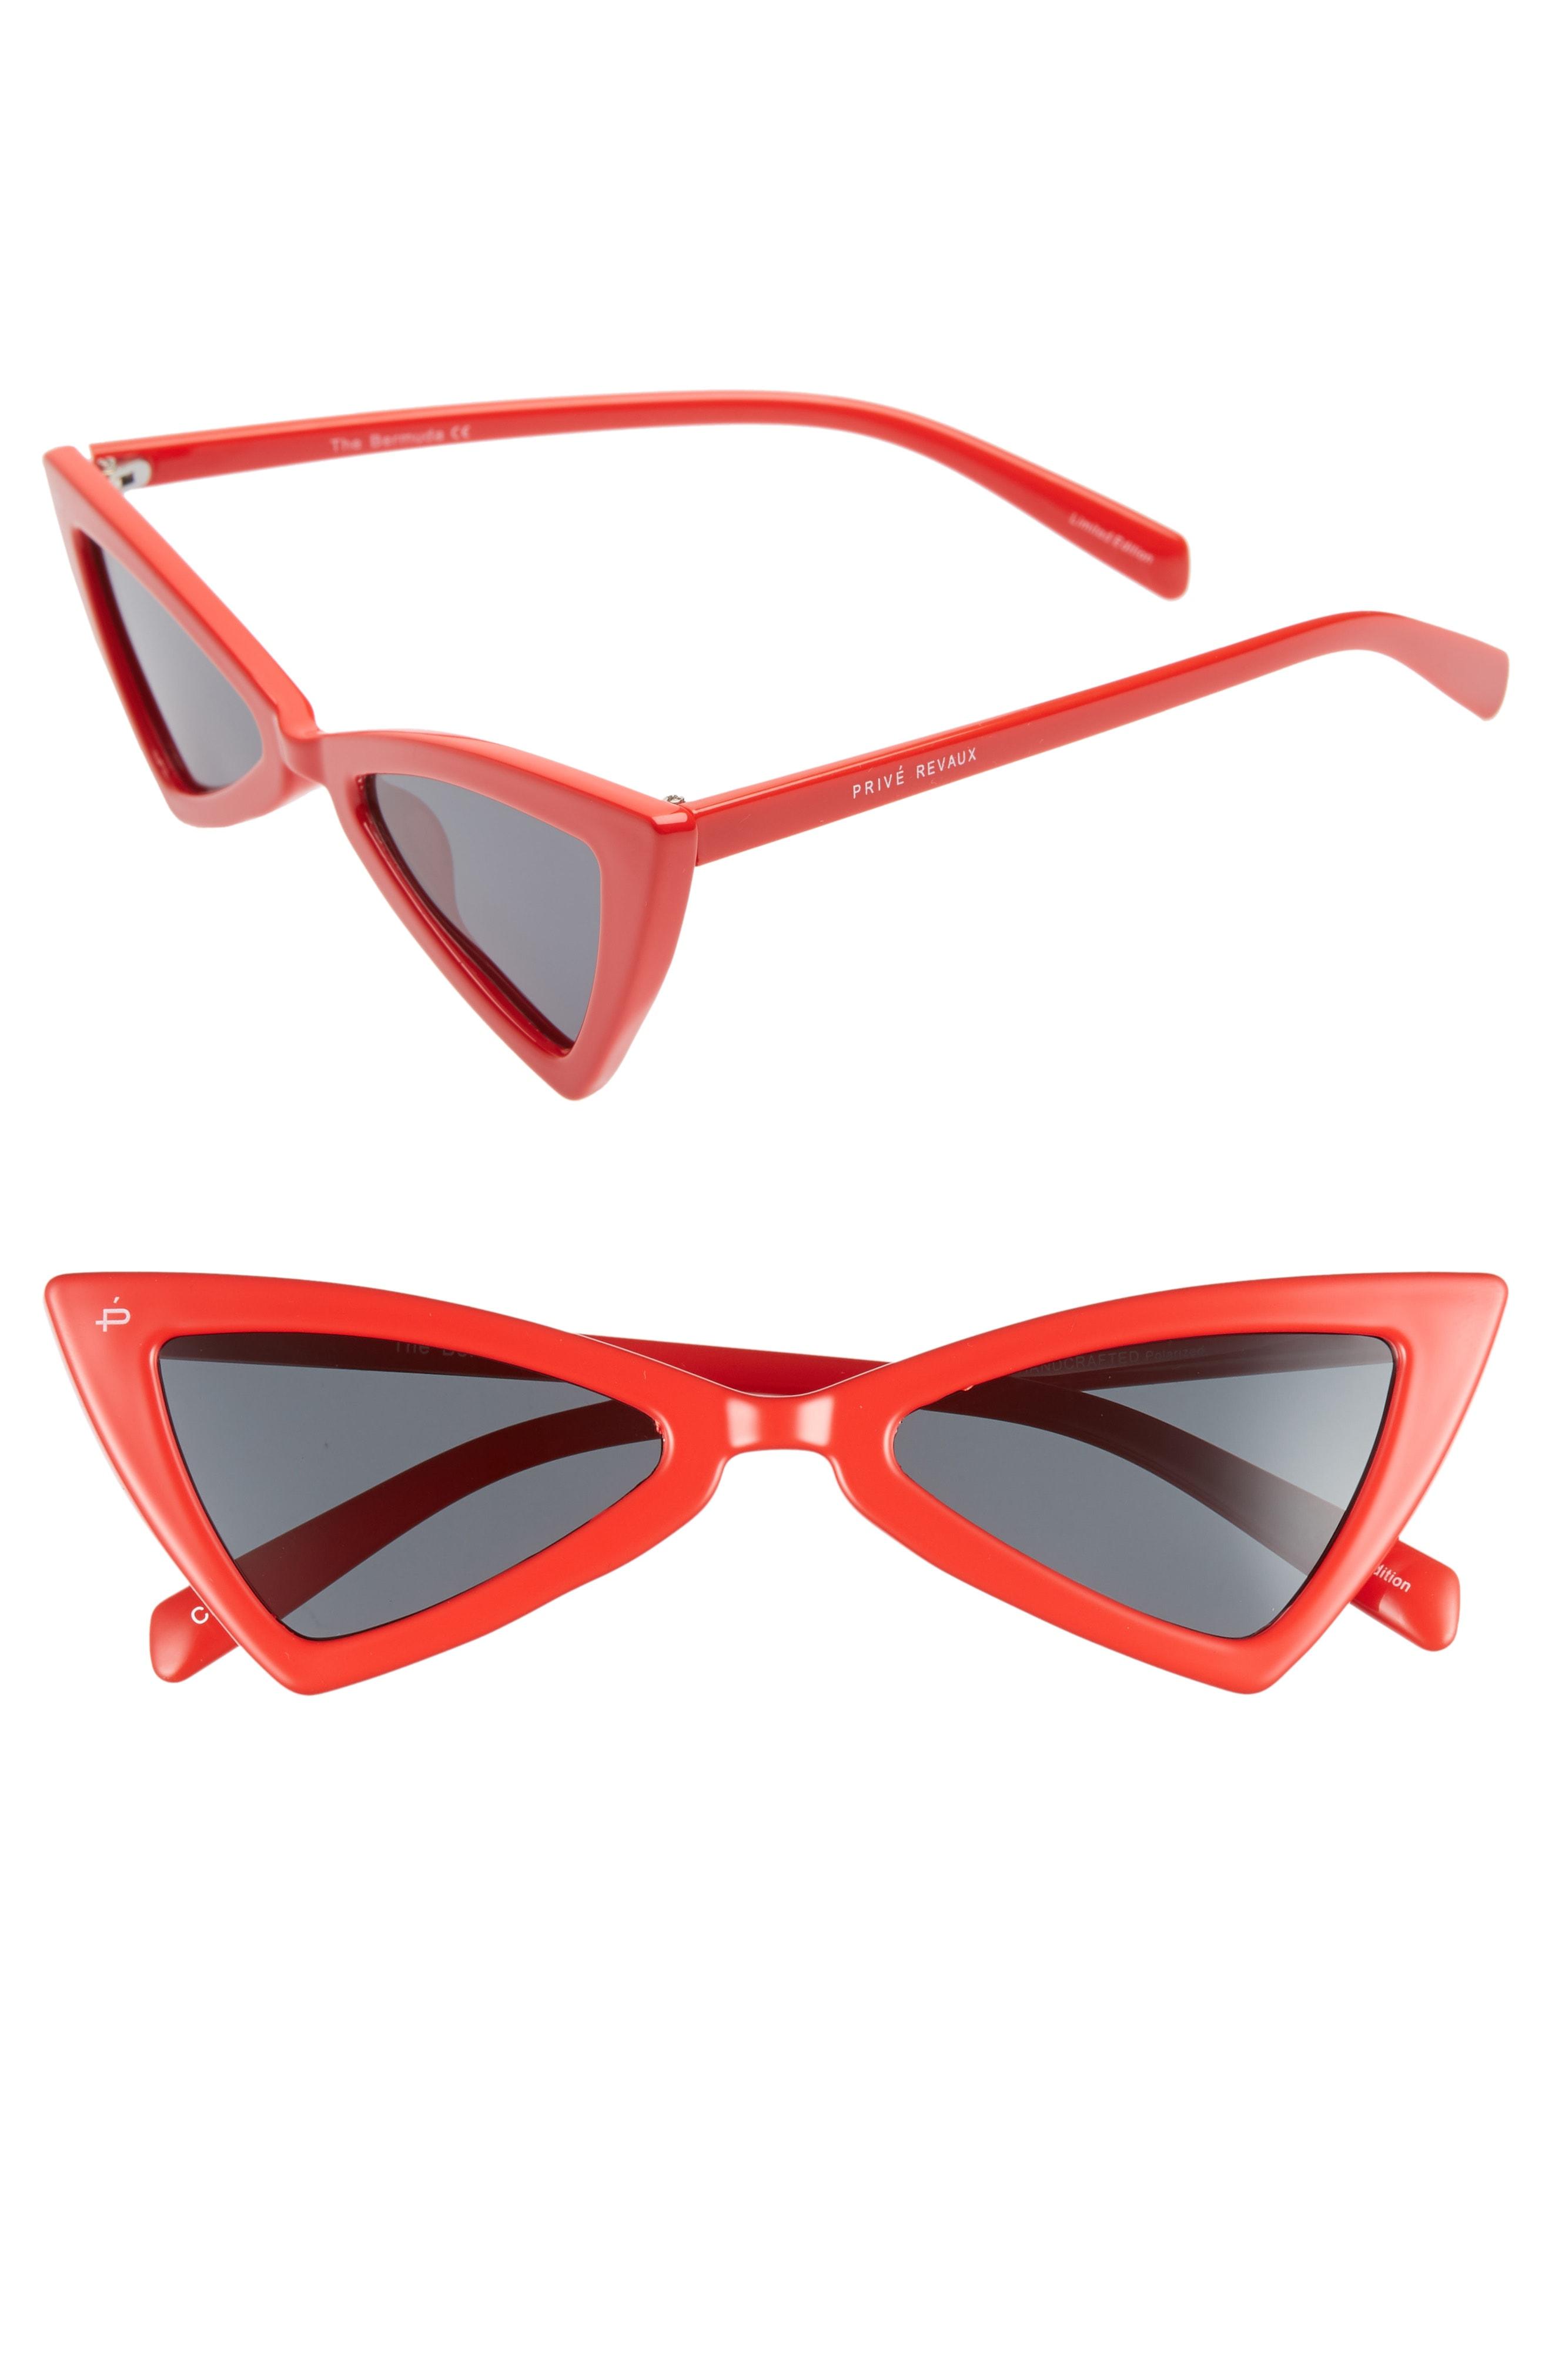 Priv Revaux The Bermuda 50mm Cat Eye Sunglasses